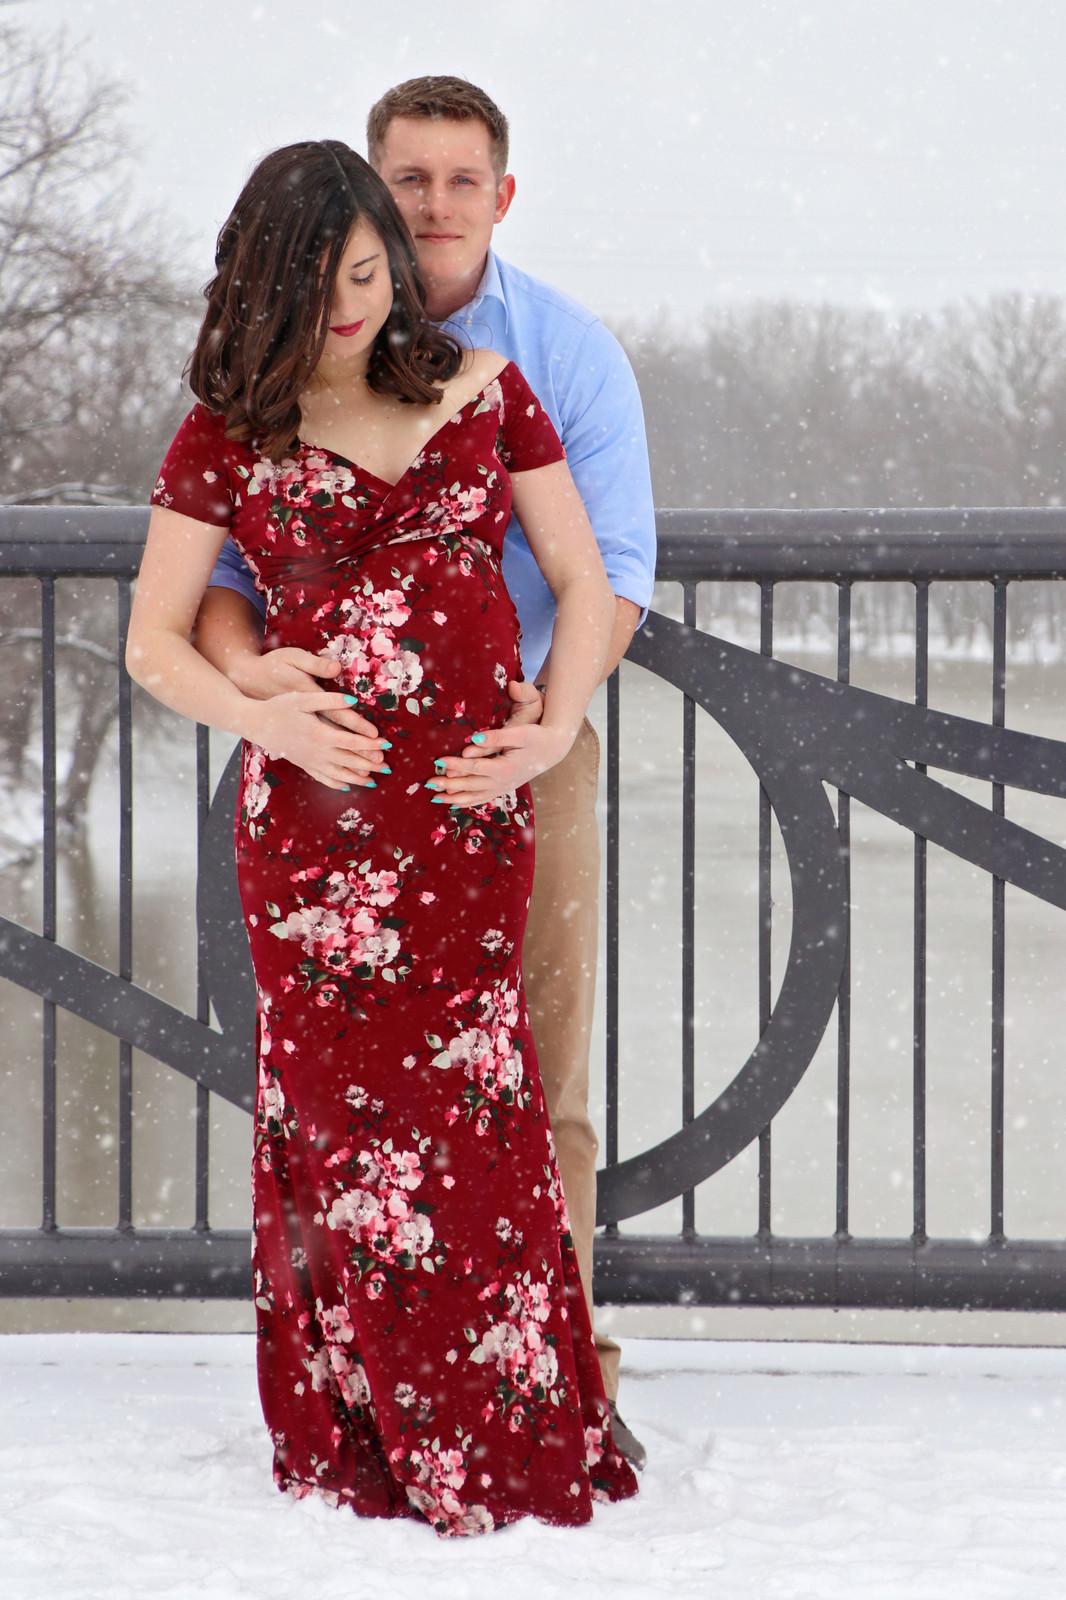 lafayette indiana dating Imvu Dating-Website